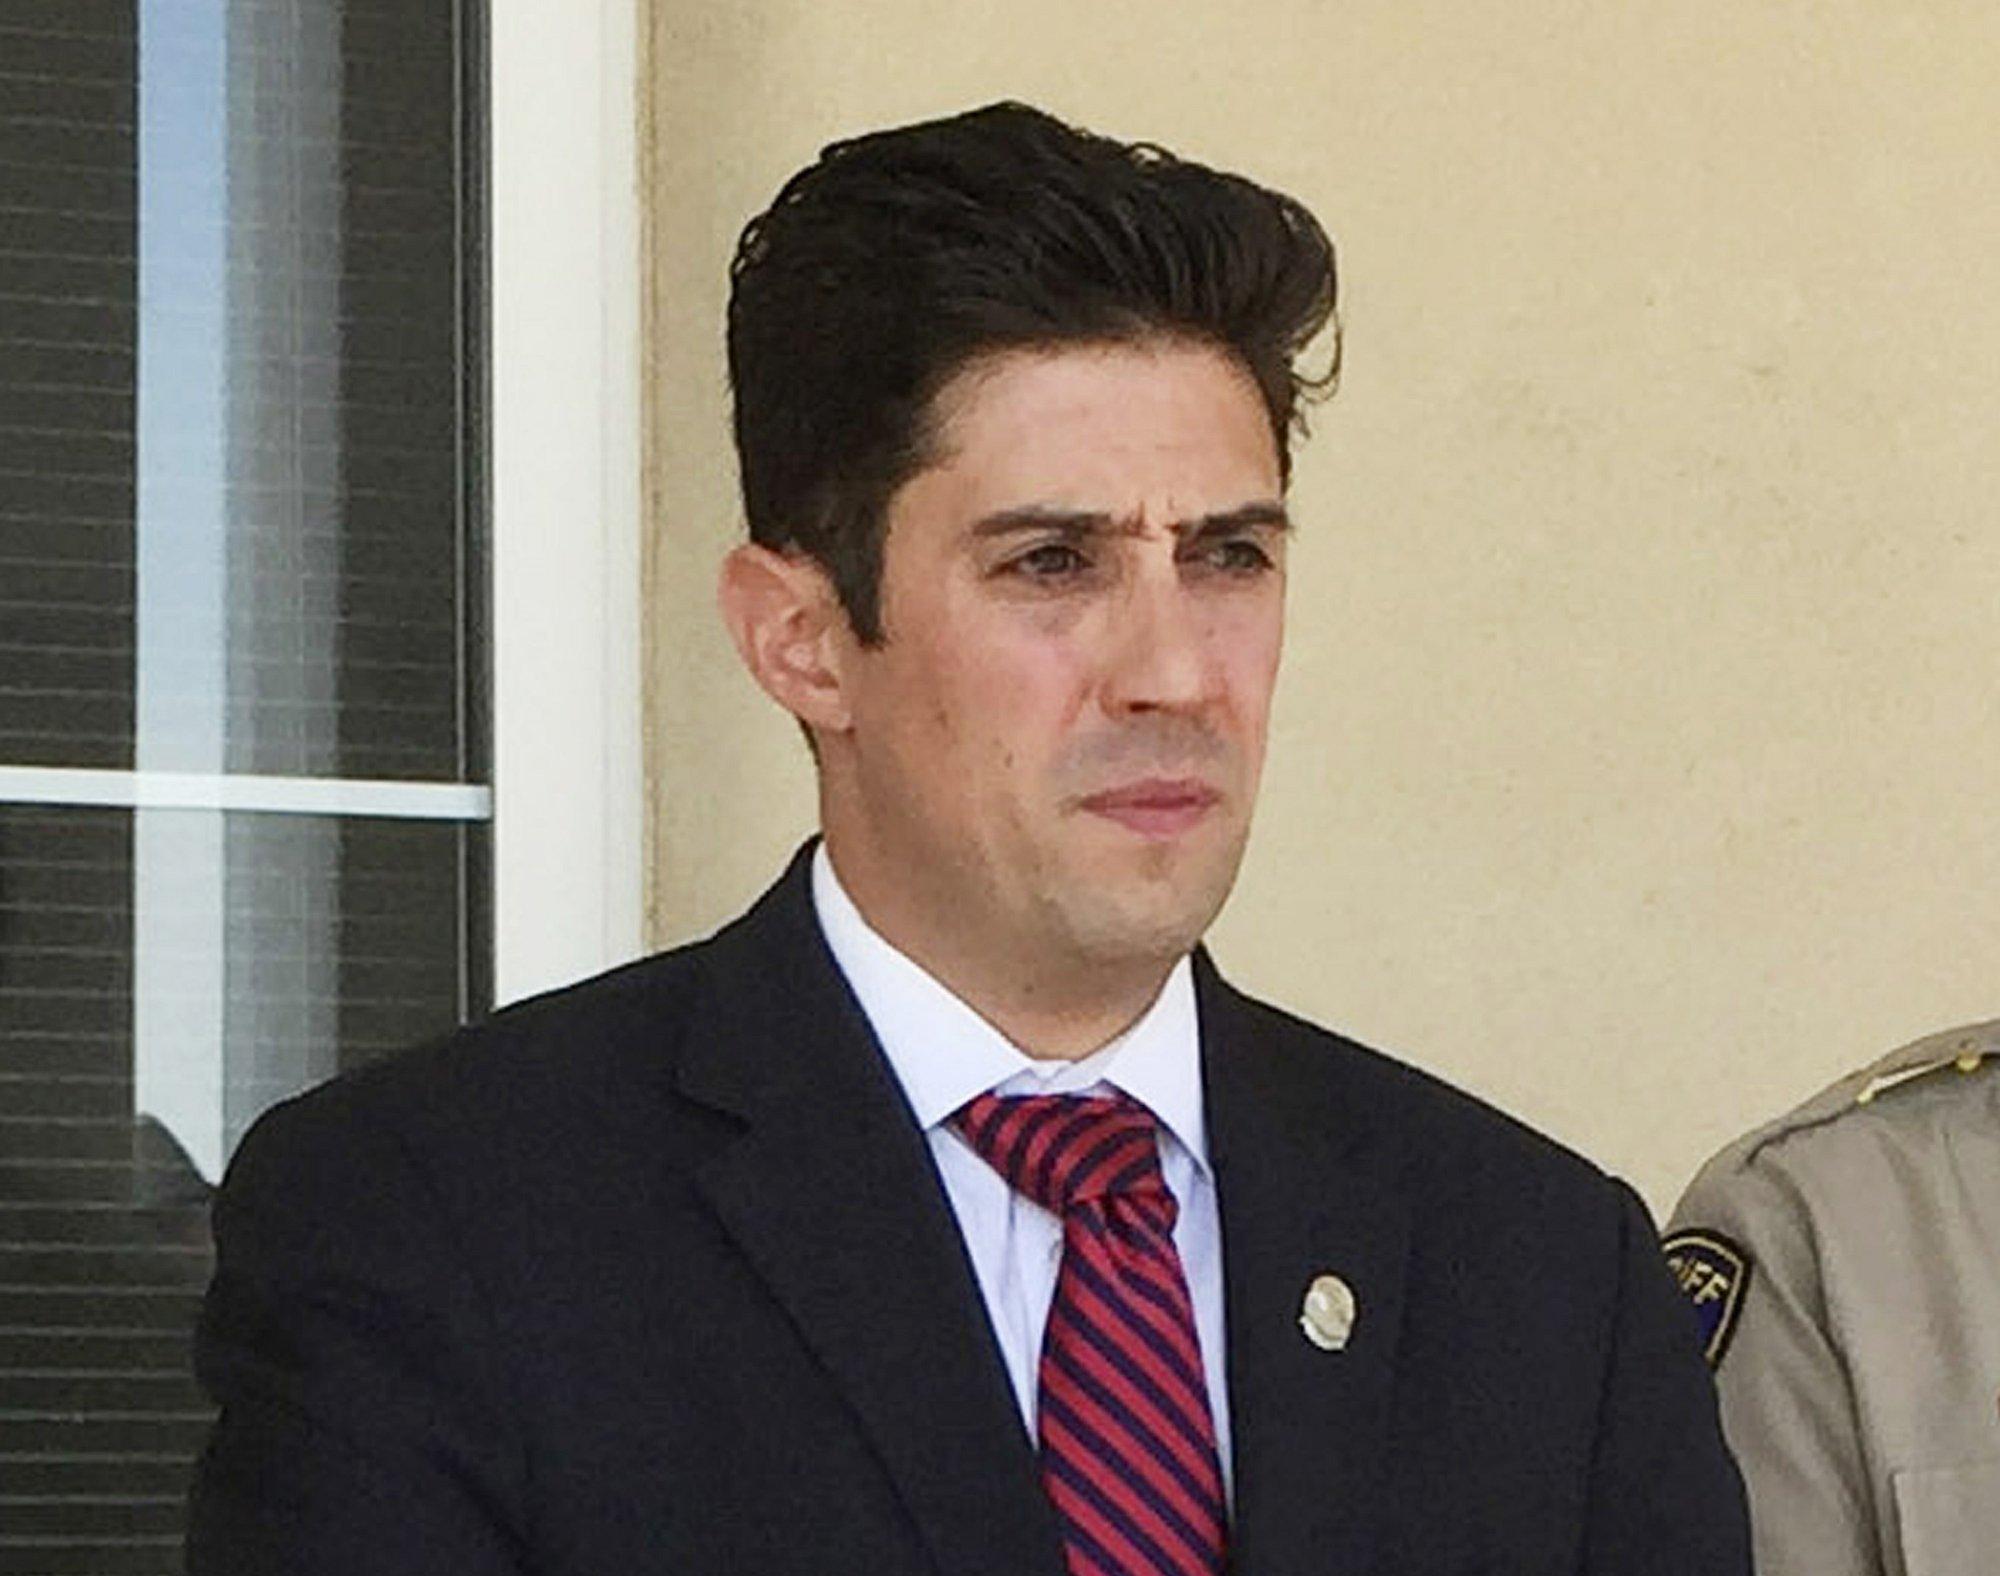 Democrat ridicules rival in New Mexico congressional primary